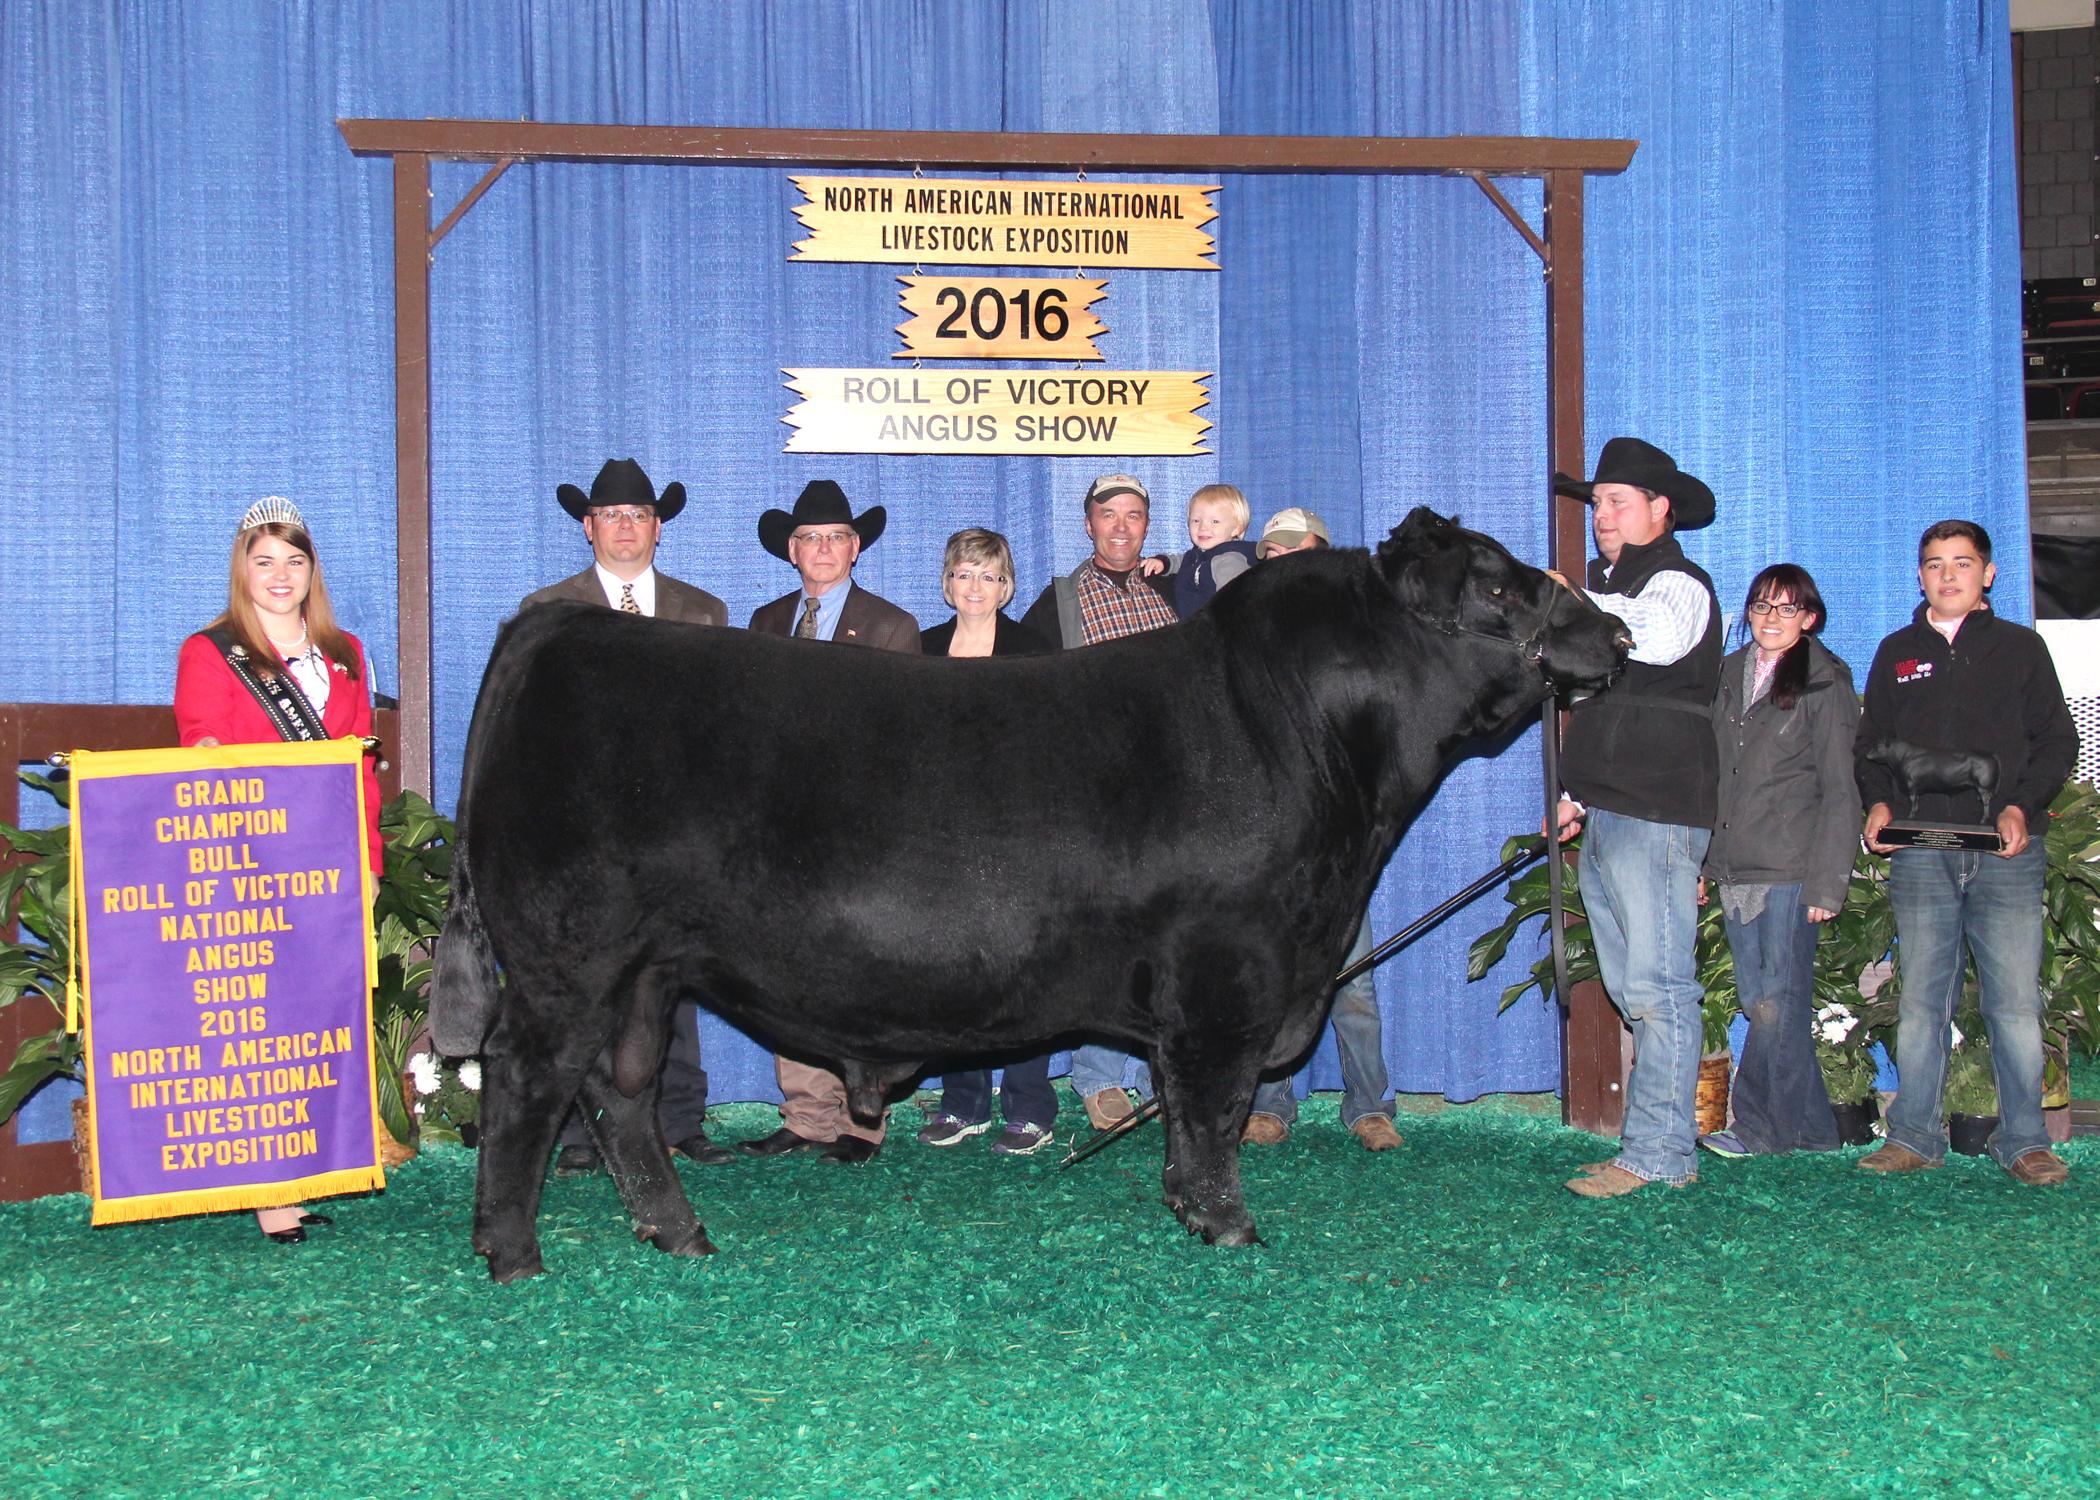 2016 North American International Livestock Exposition